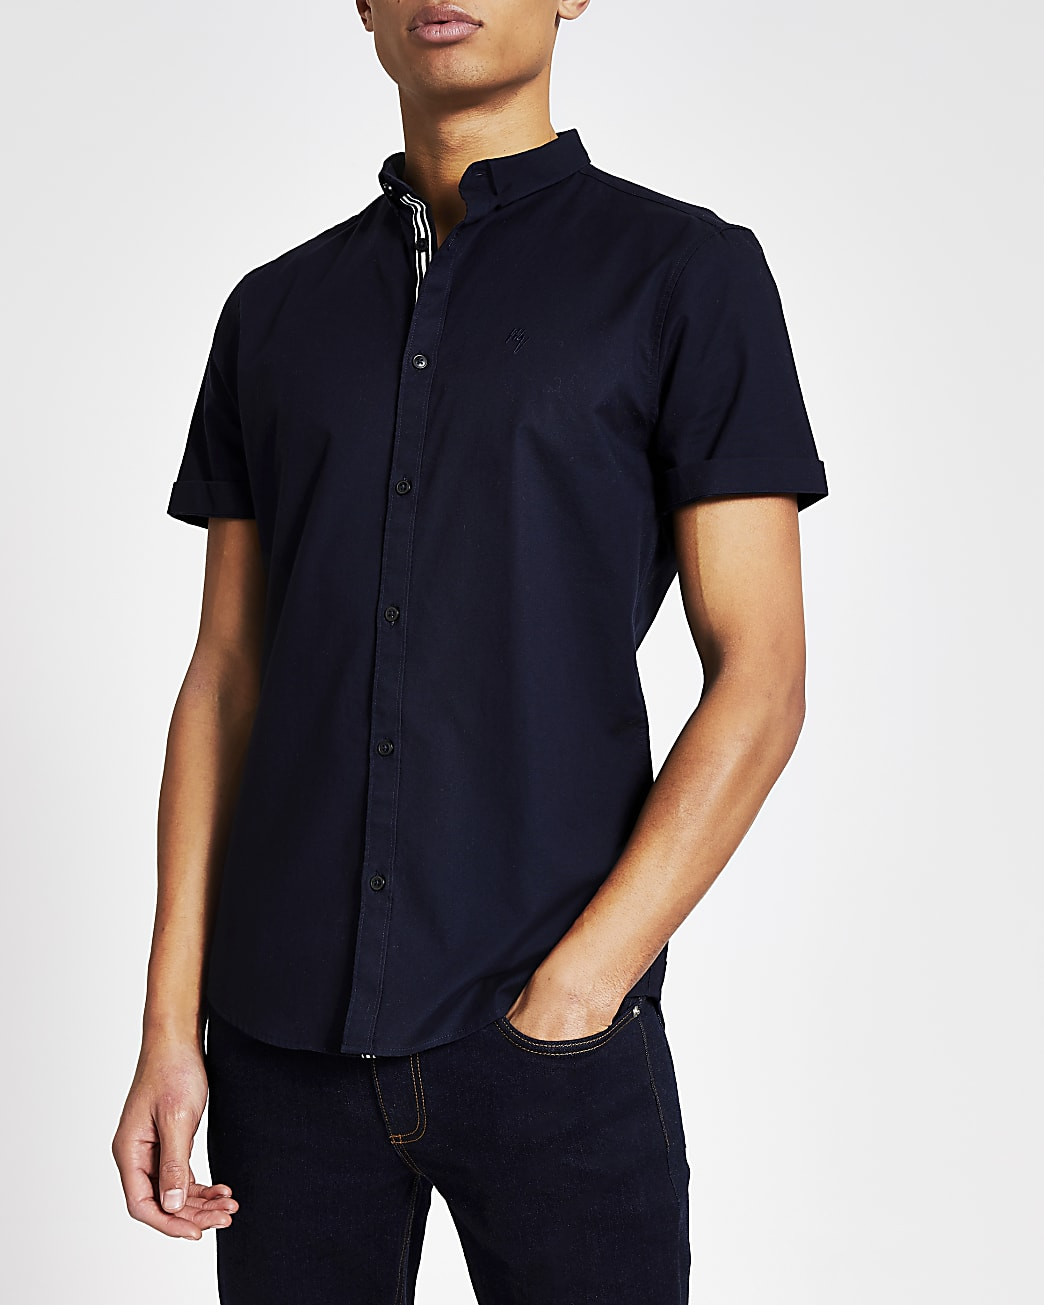 Maison Riviera navy short sleeve Oxford shirt